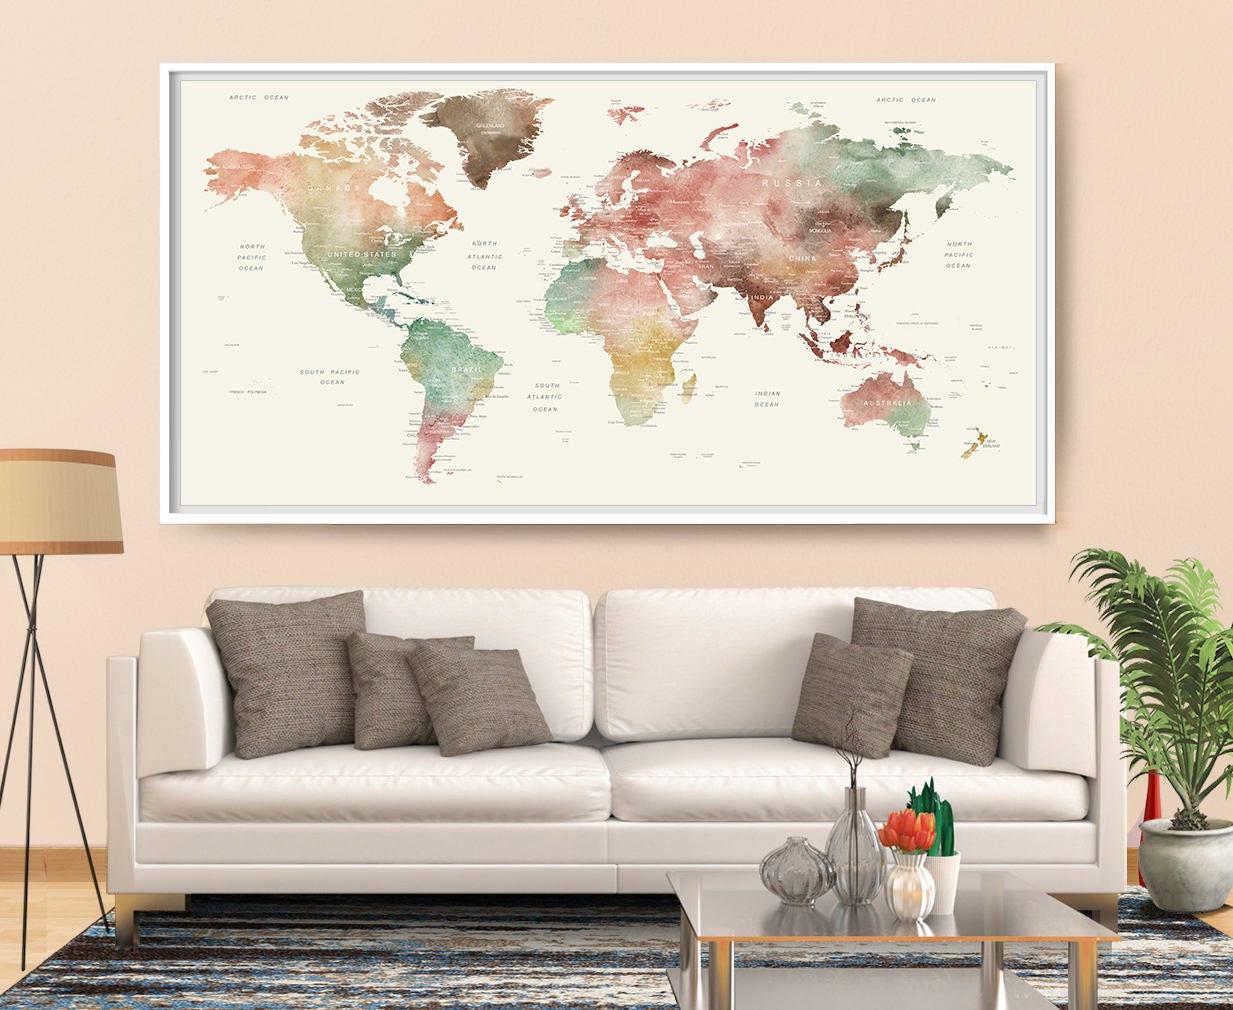 monde carte murale art aquarelle carte monde carte du. Black Bedroom Furniture Sets. Home Design Ideas